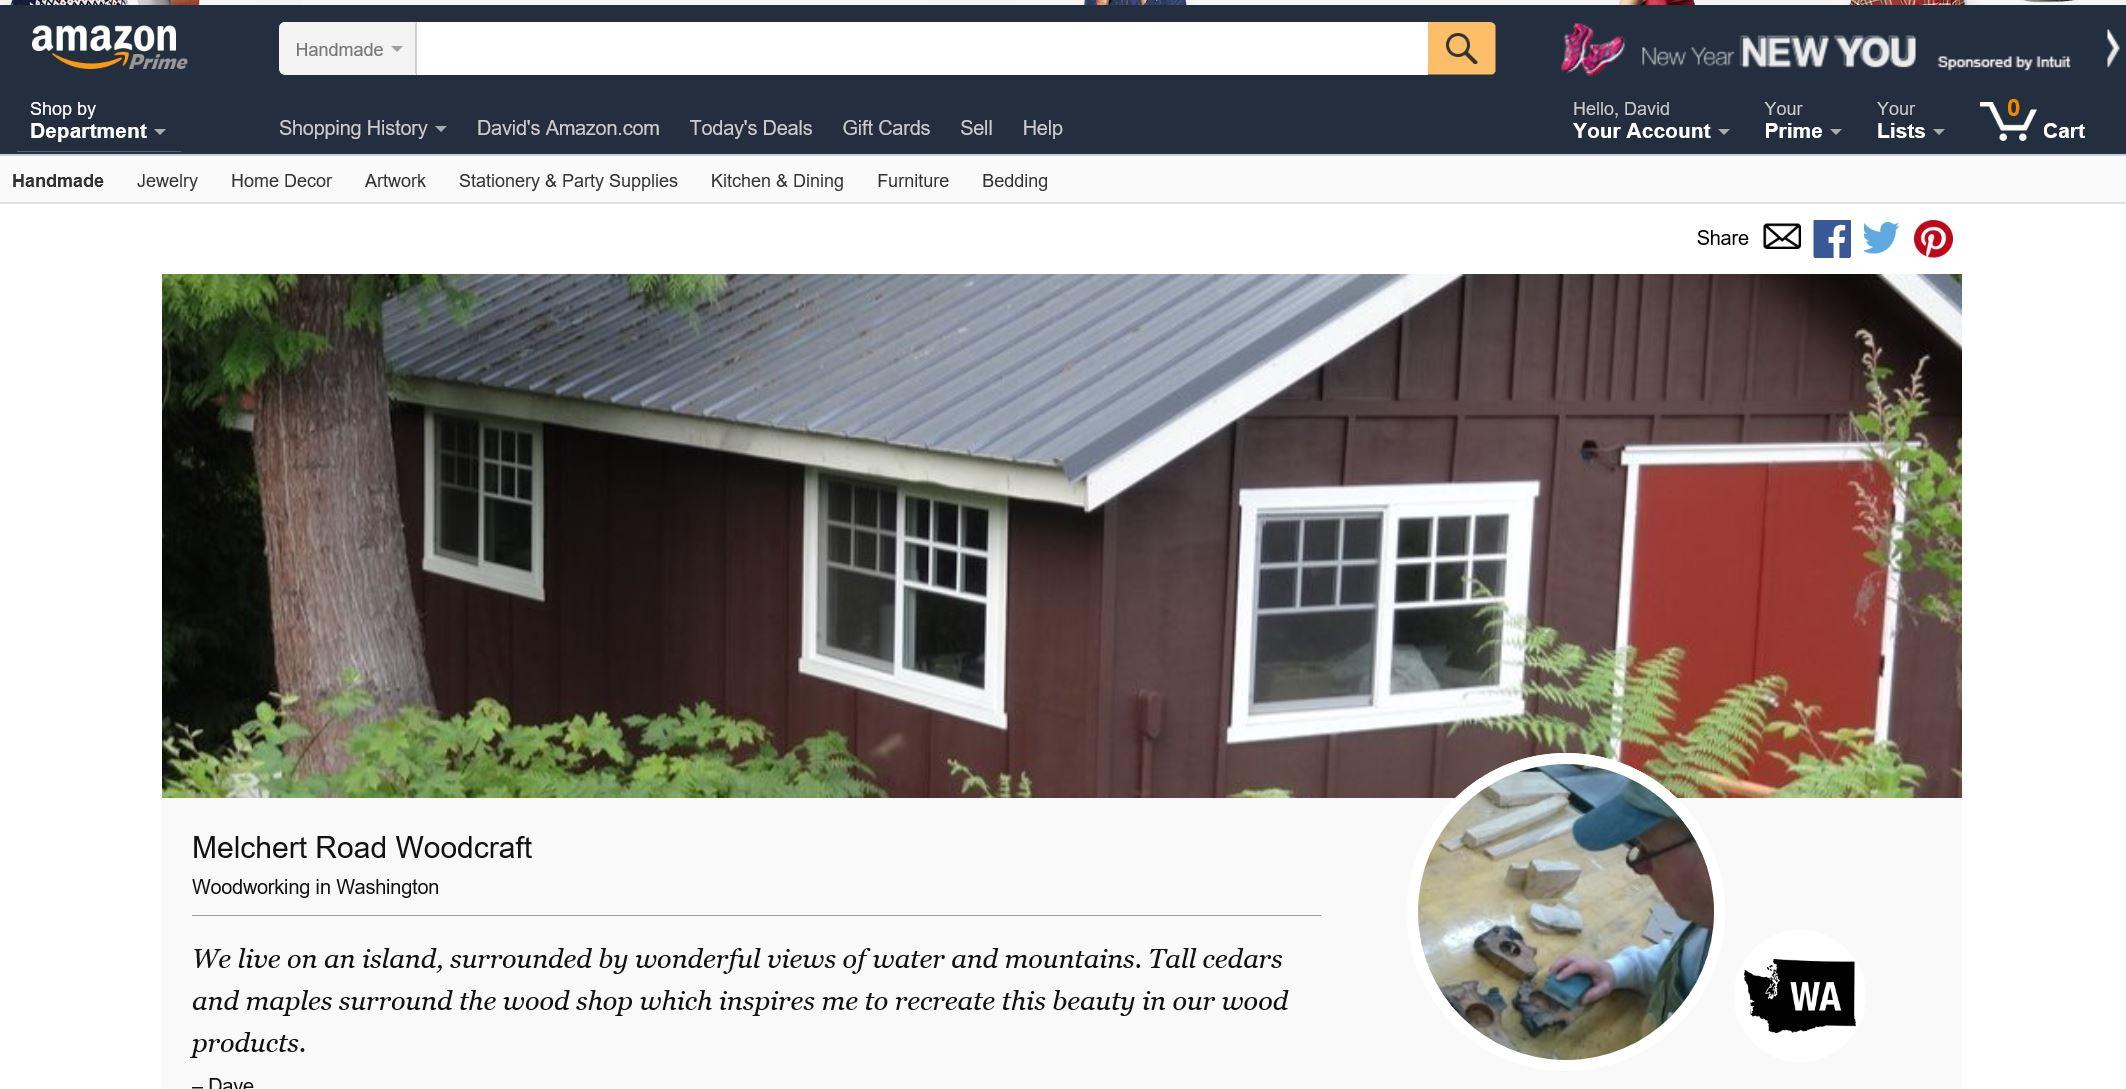 Now Online Shop On Amazon Melchert Road